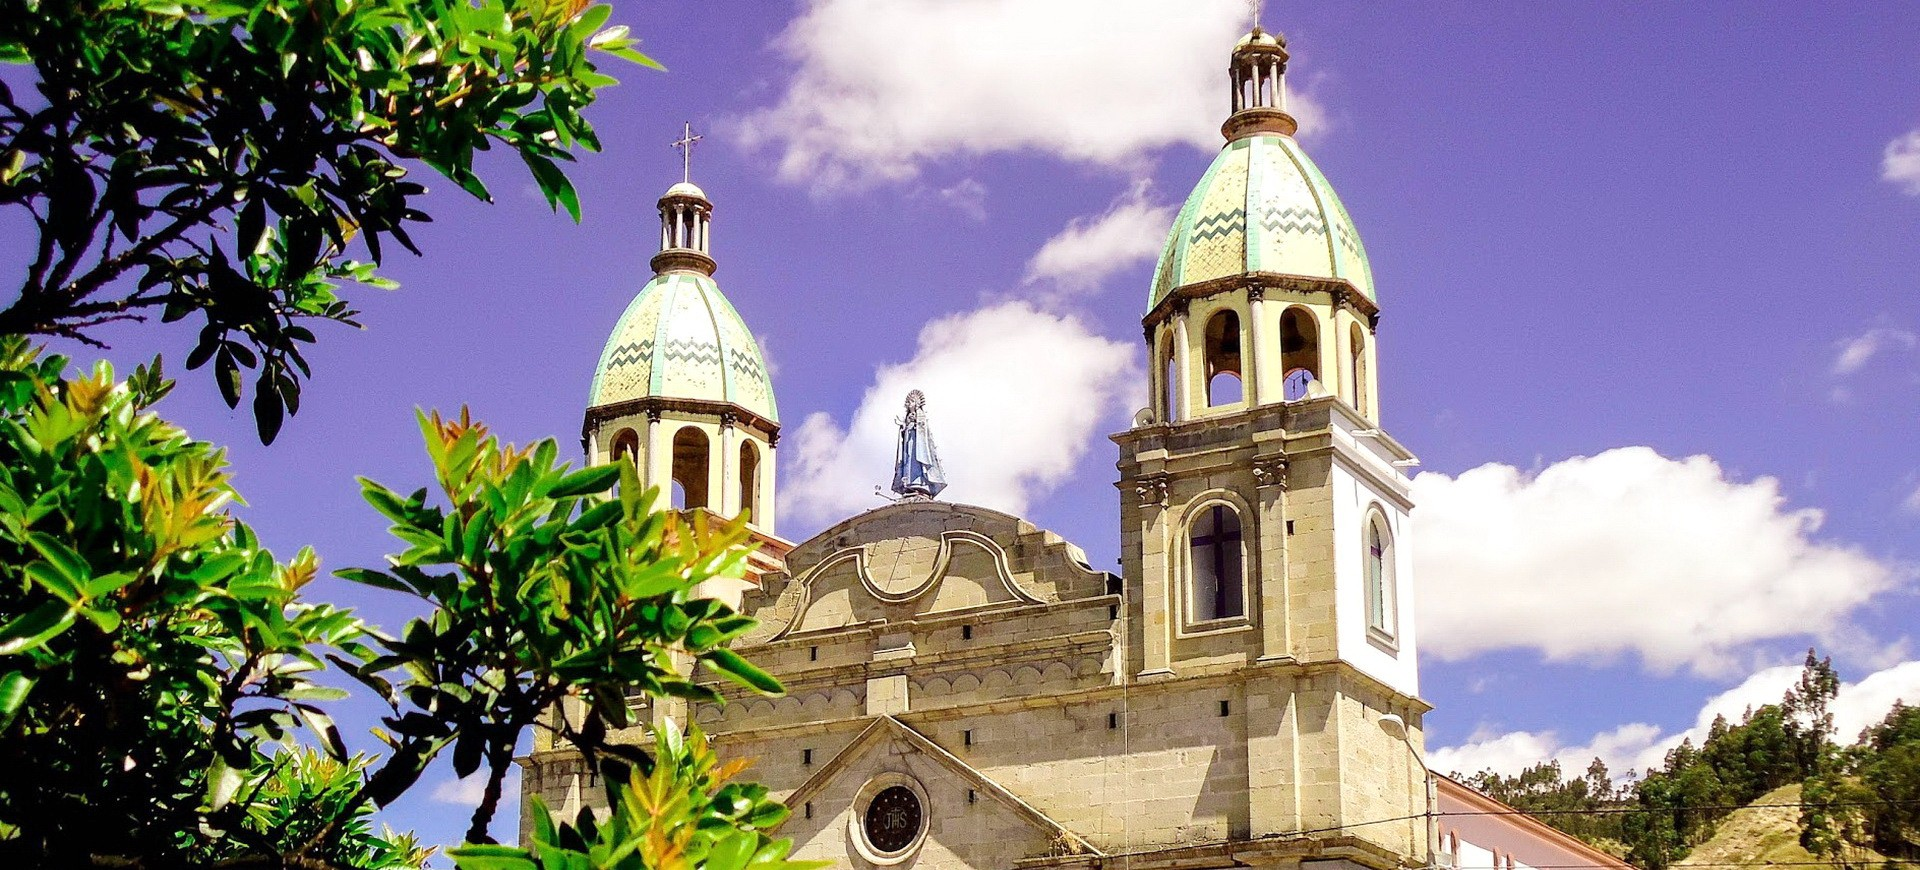 Equateur Riobamba Yaruquies Eglise